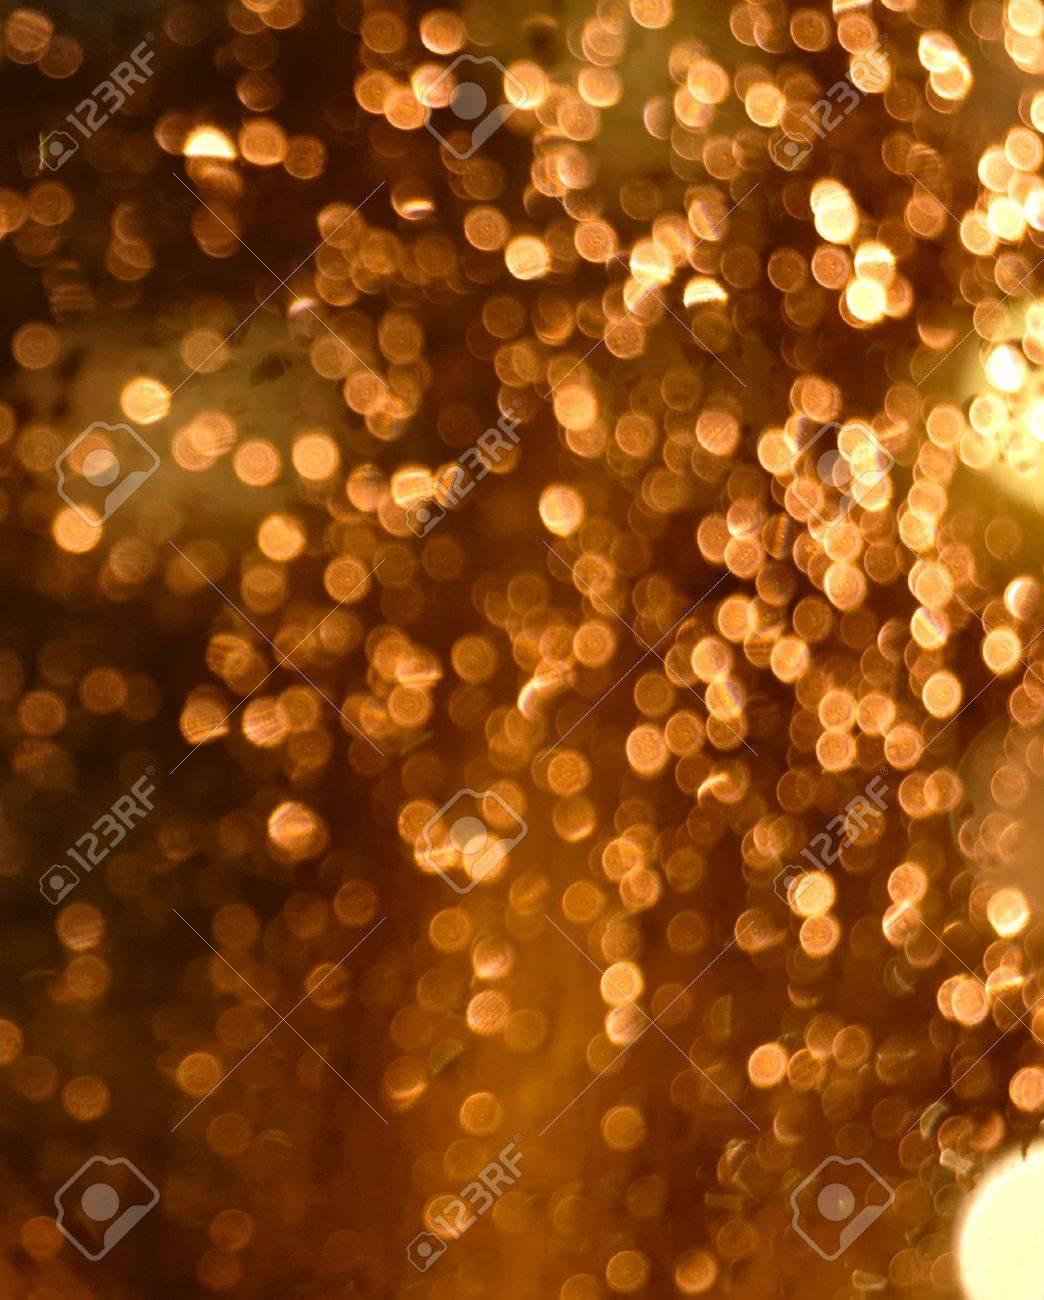 Blurred Christmas Blurred Christmas Lights at